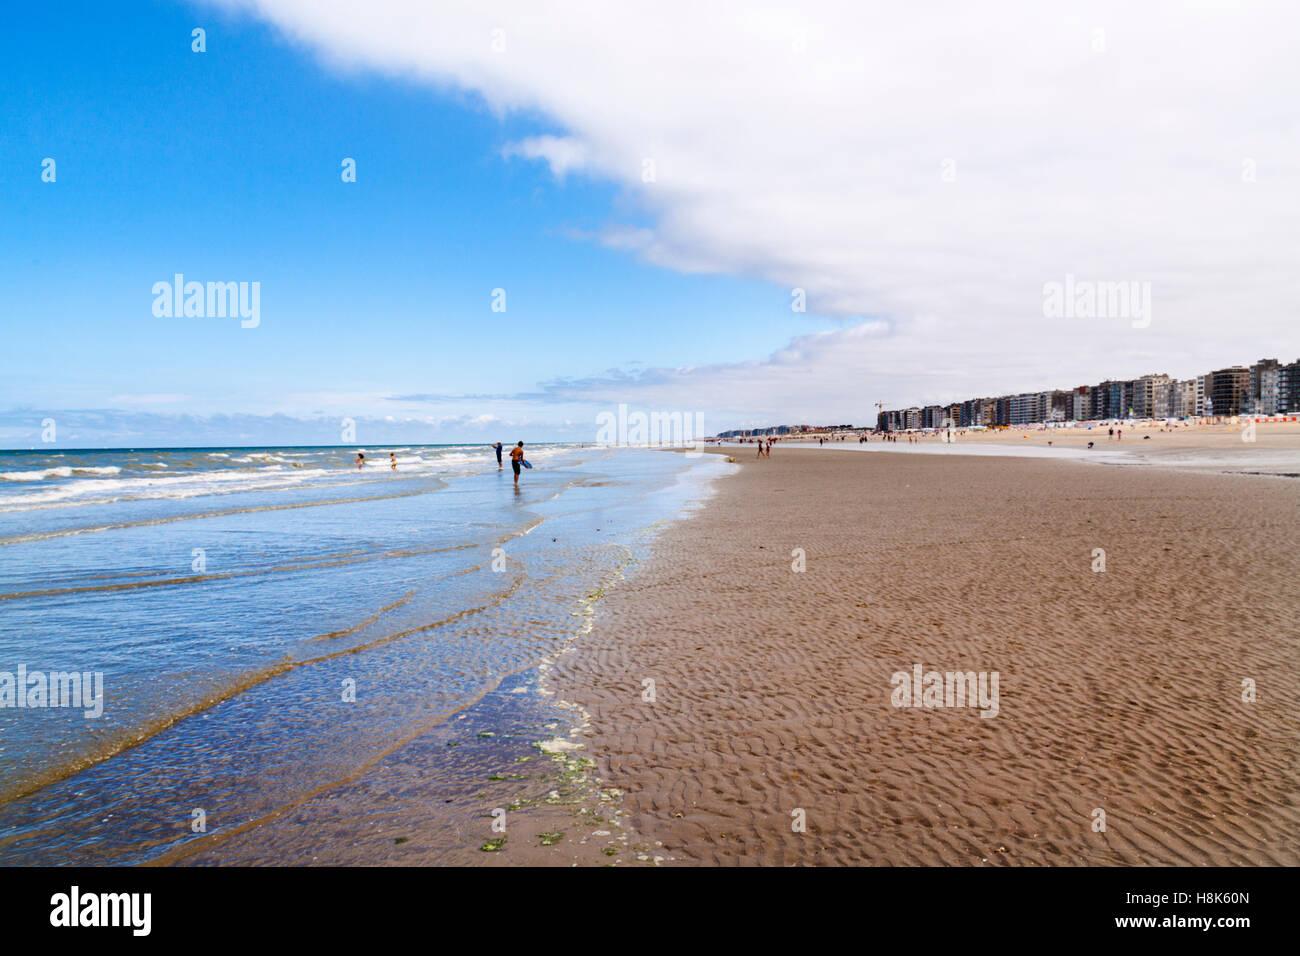 Vast sandy beach in the seaside resort of Middelkerke, Belgium Stock Photo